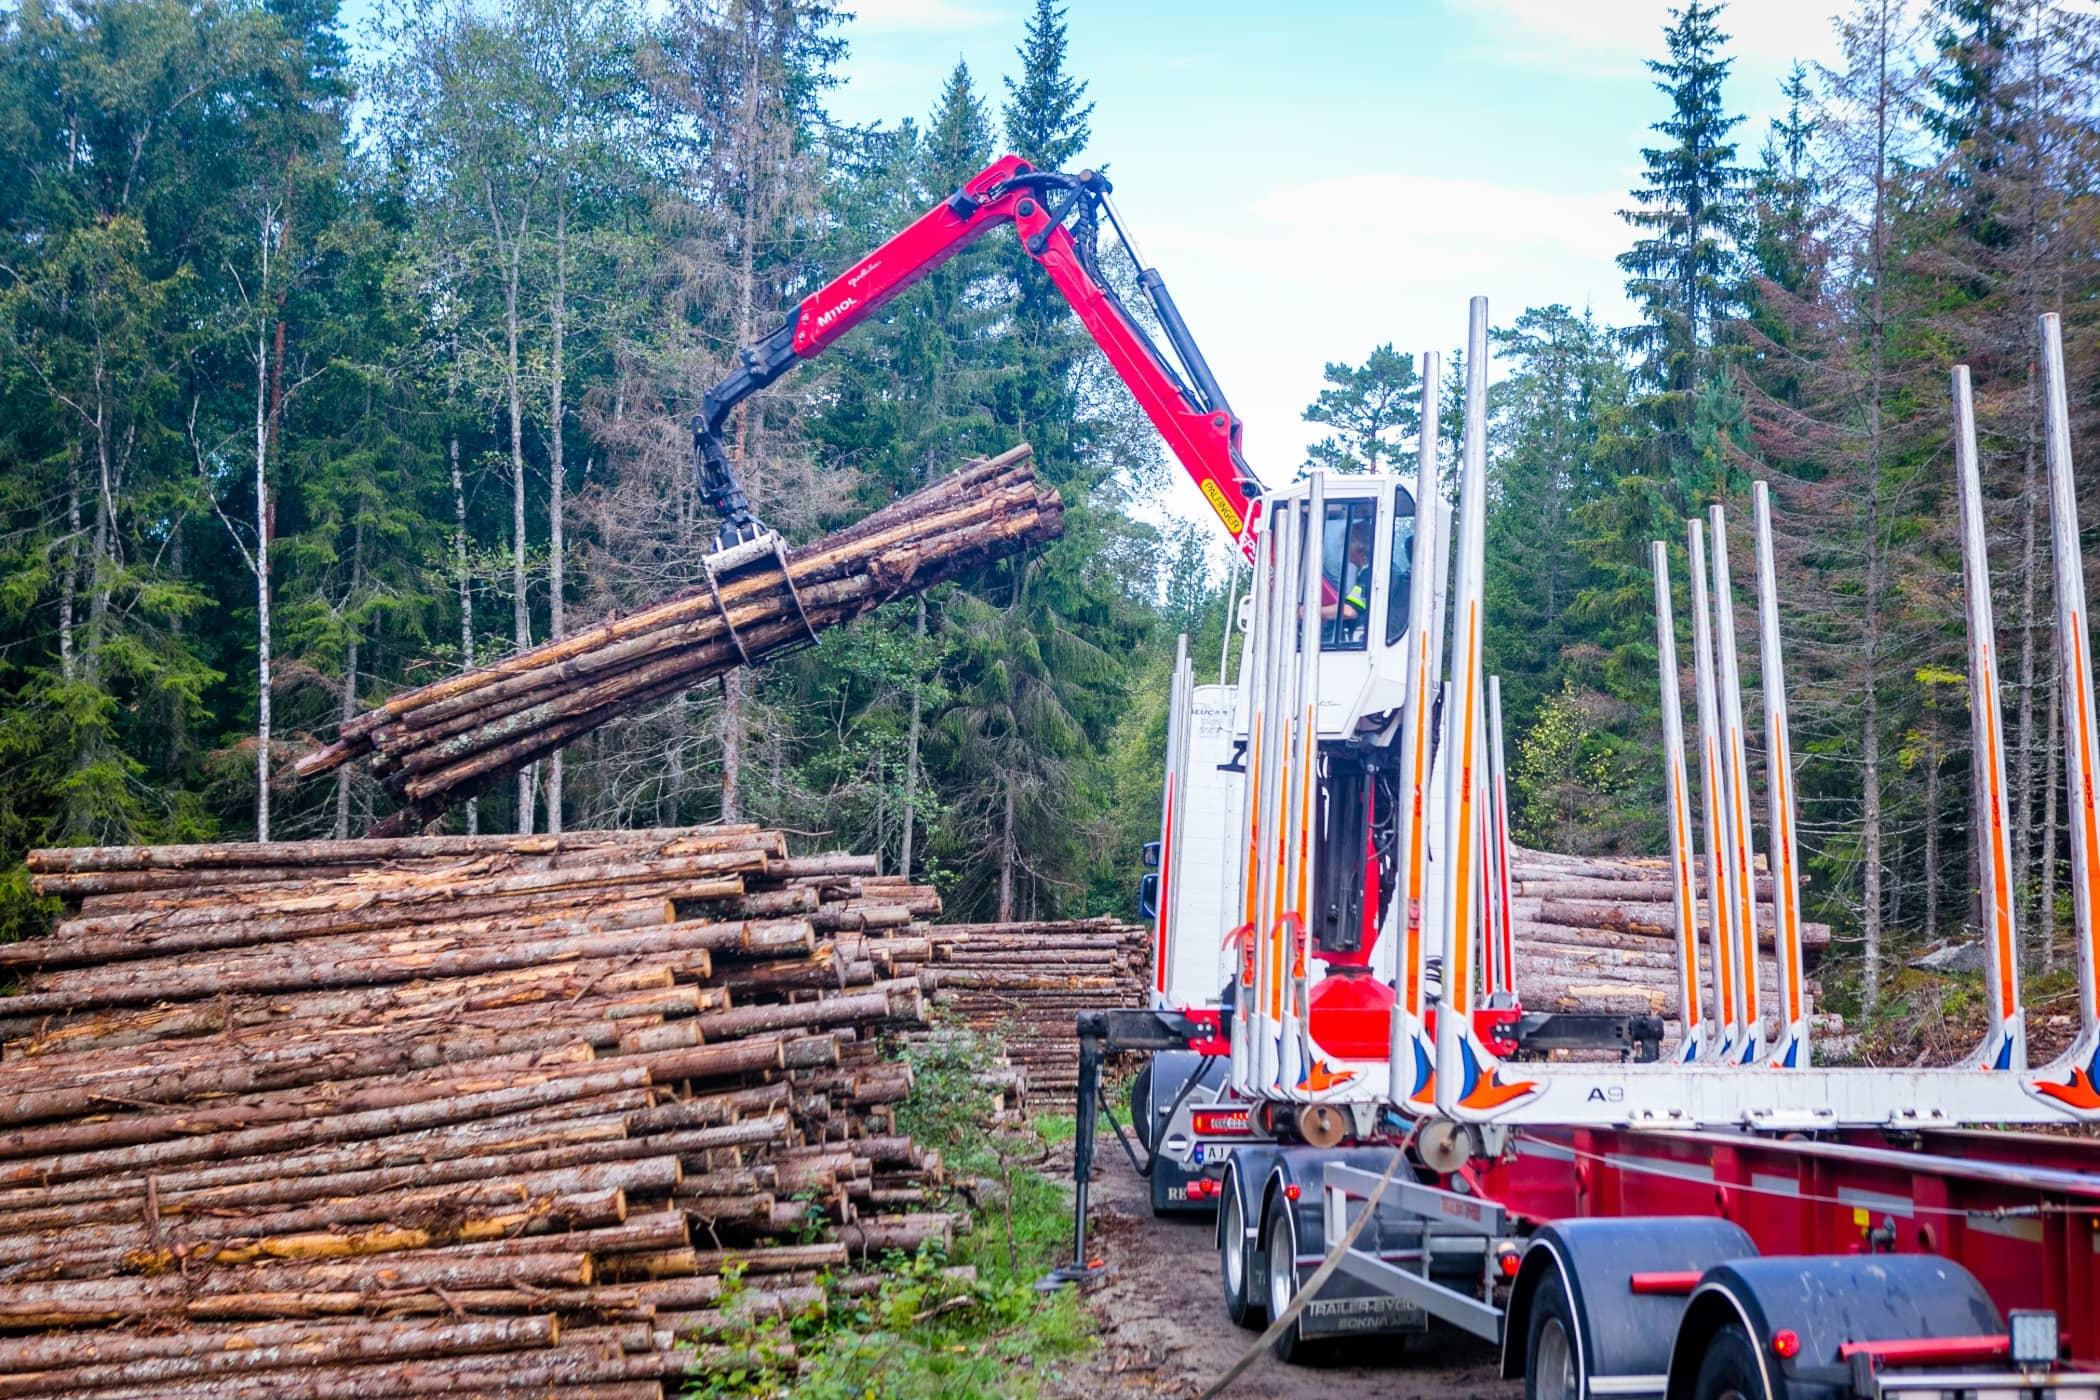 Wood, Construction, Transport, Tree, Crane